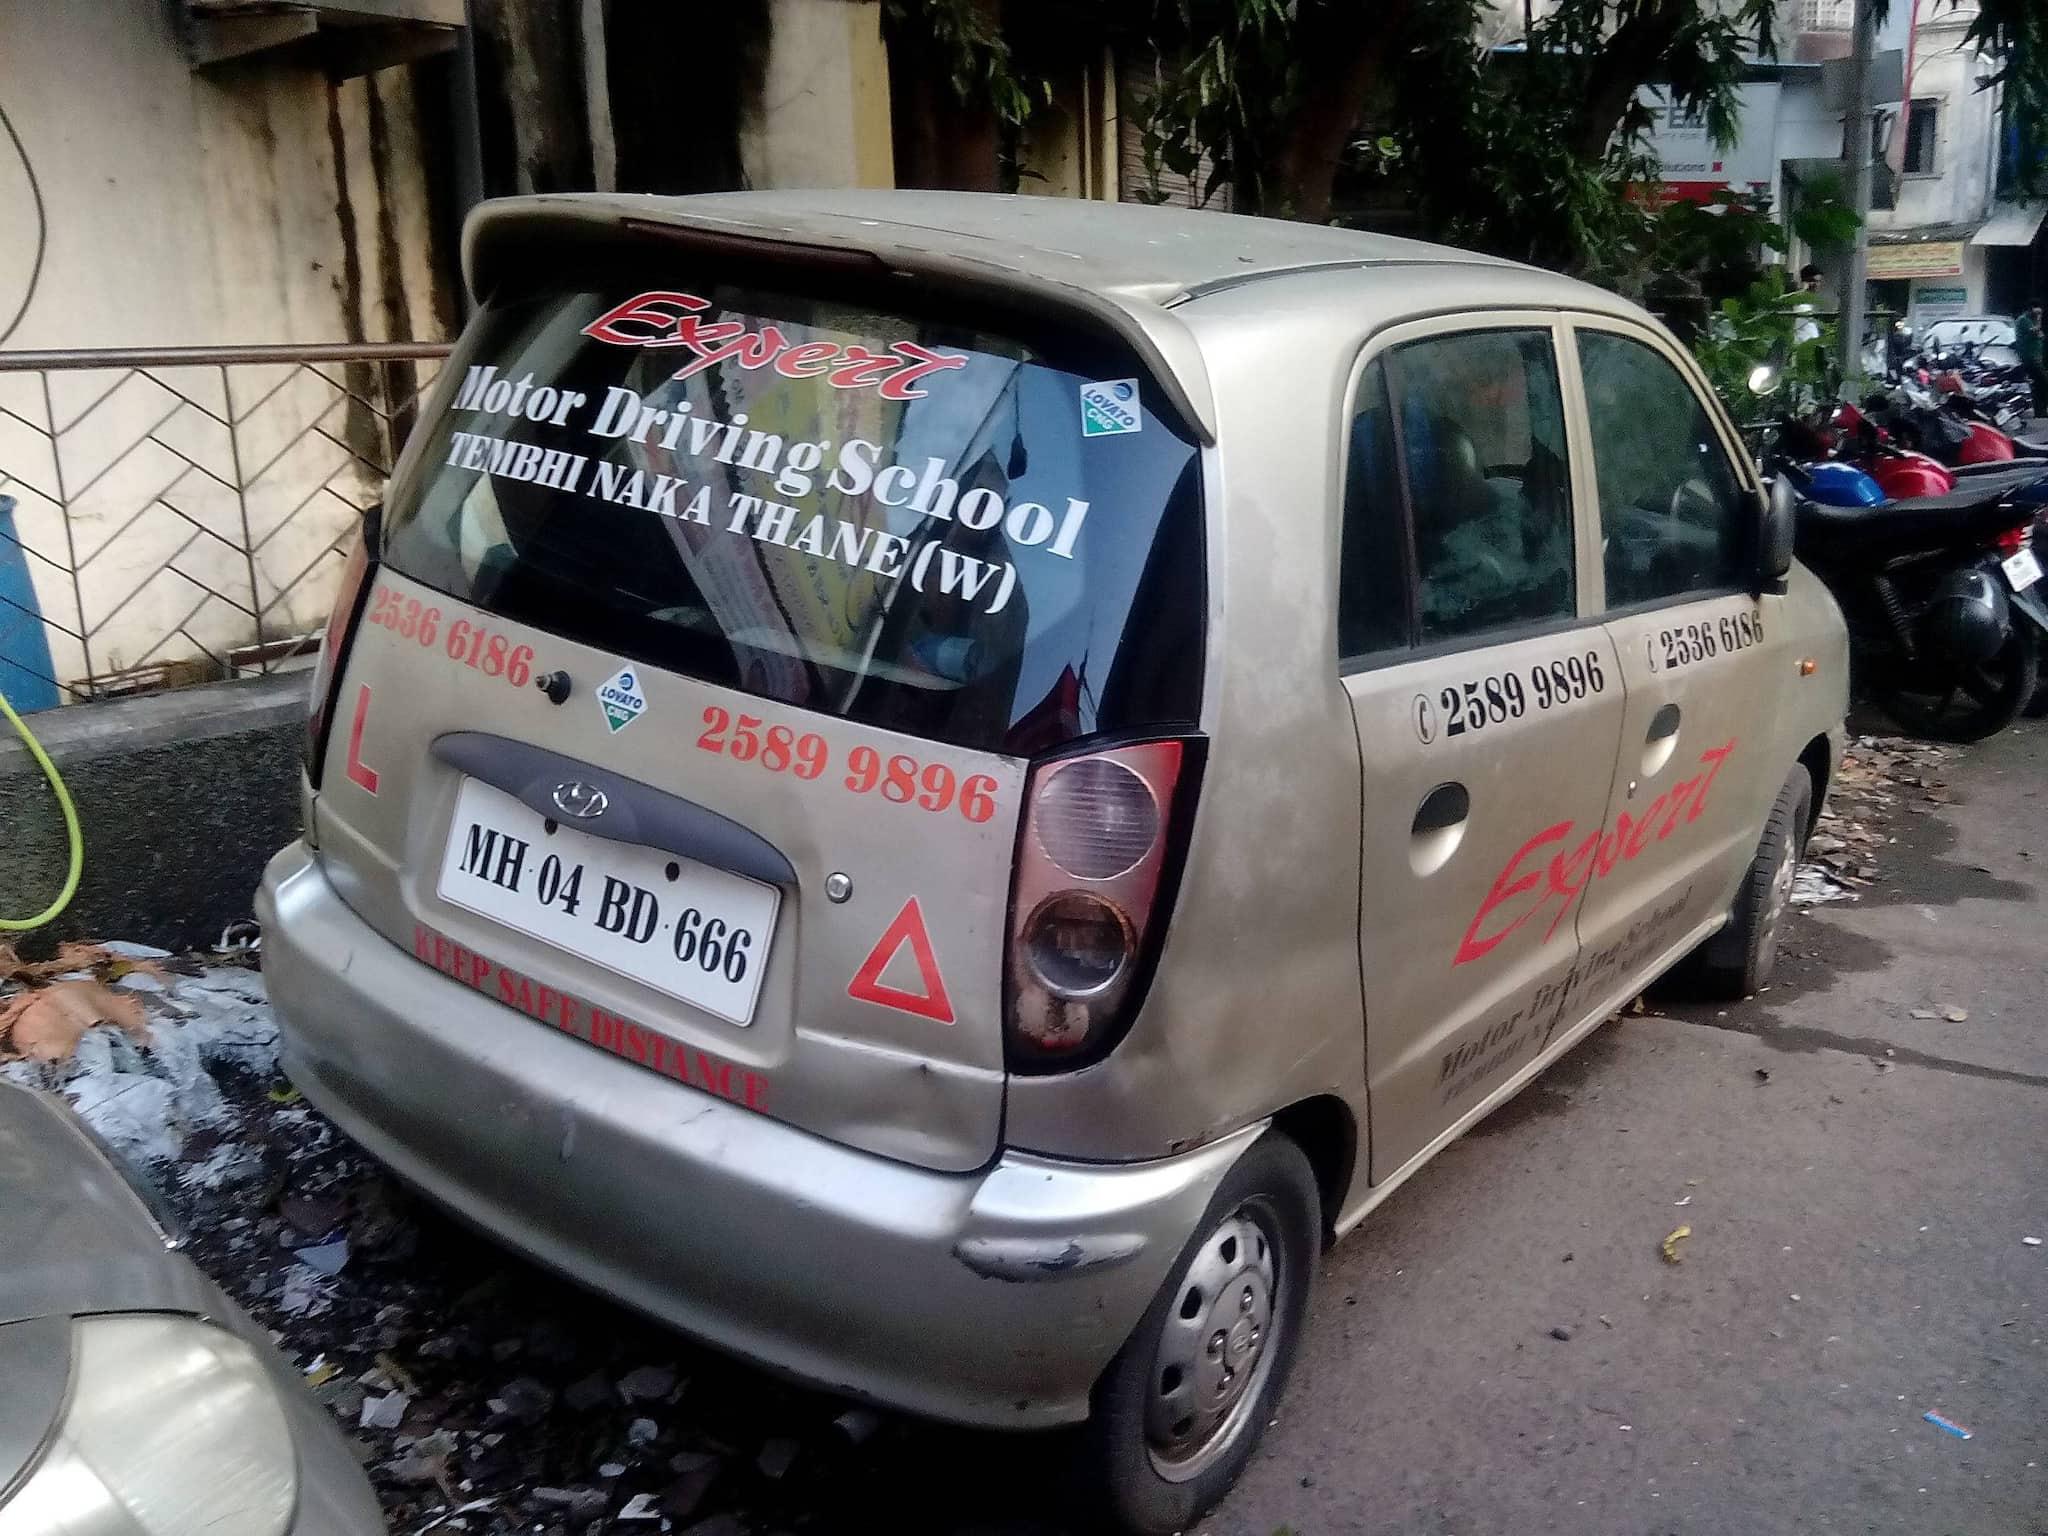 ... Car Side View - Expert Motor Driving School Photos, Thane West, Mumbai - Motor ...